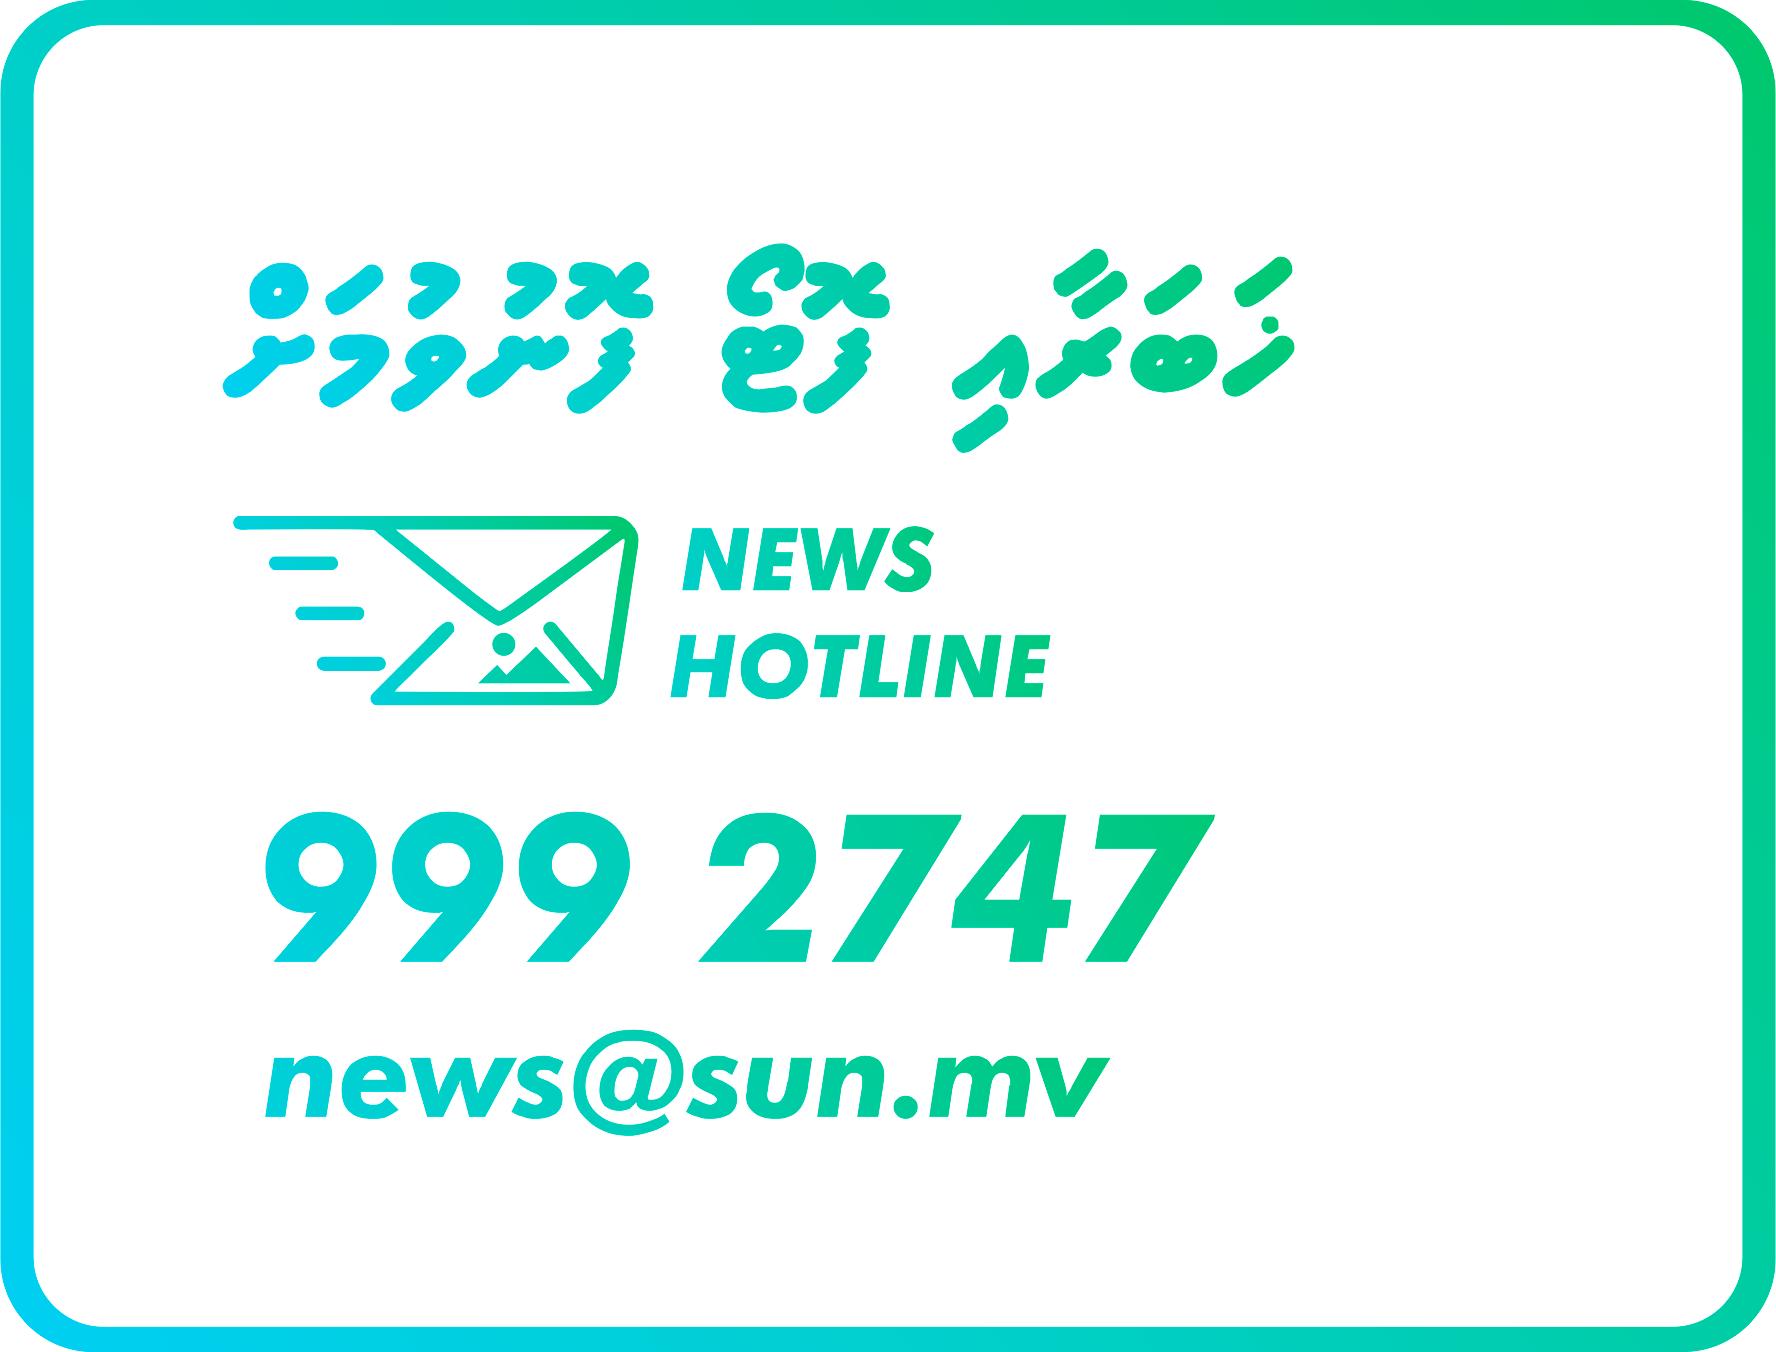 Sun Hotline